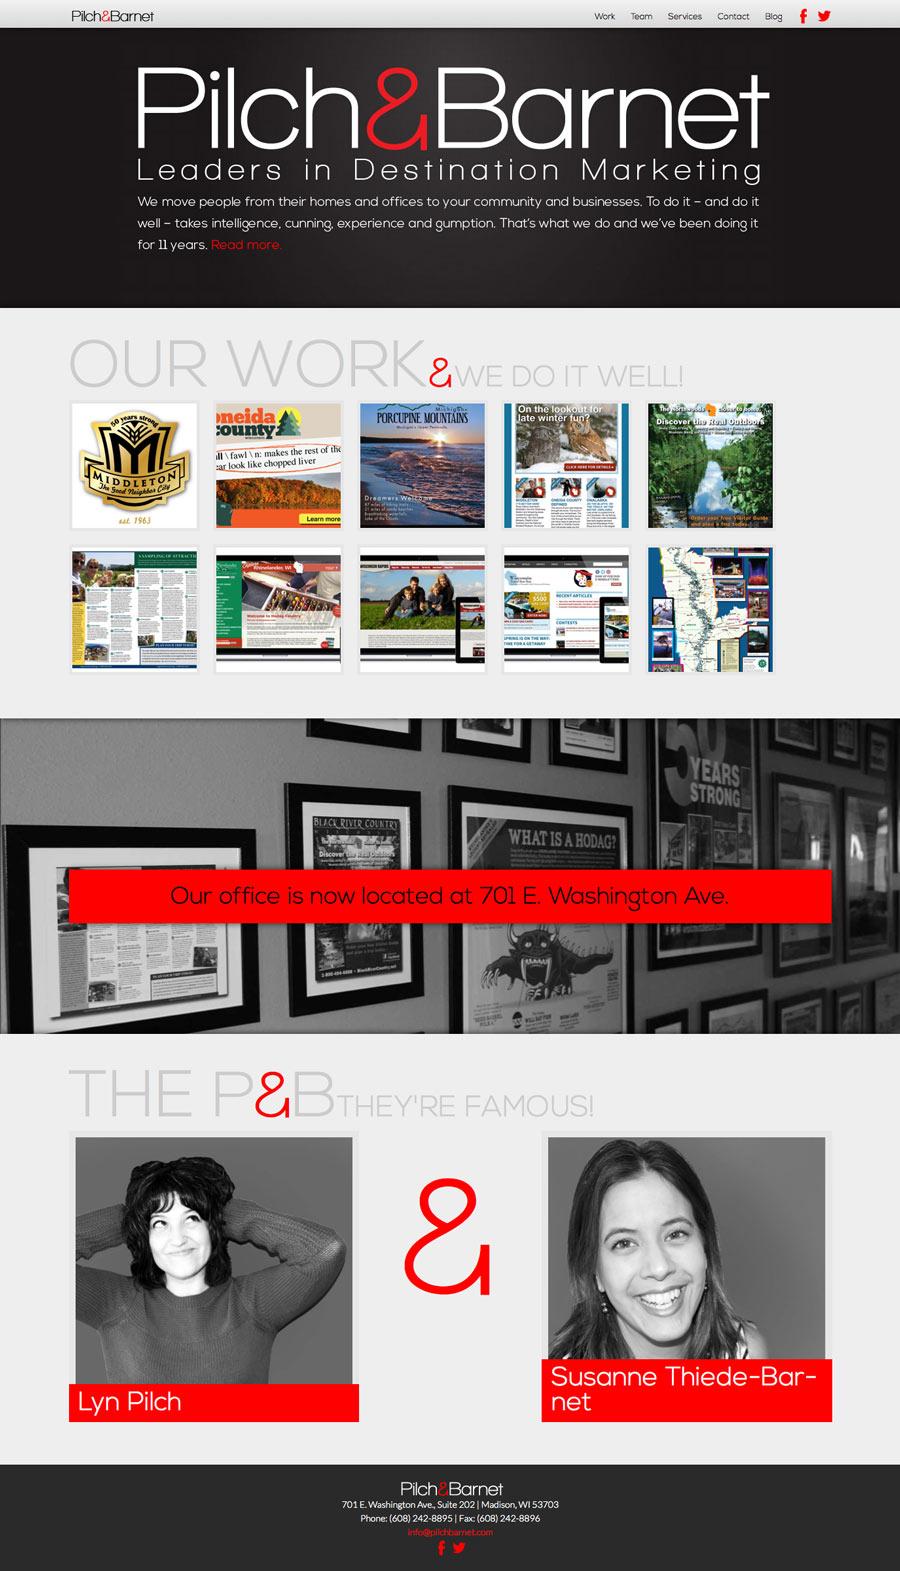 Pilch & Barnet Homepage